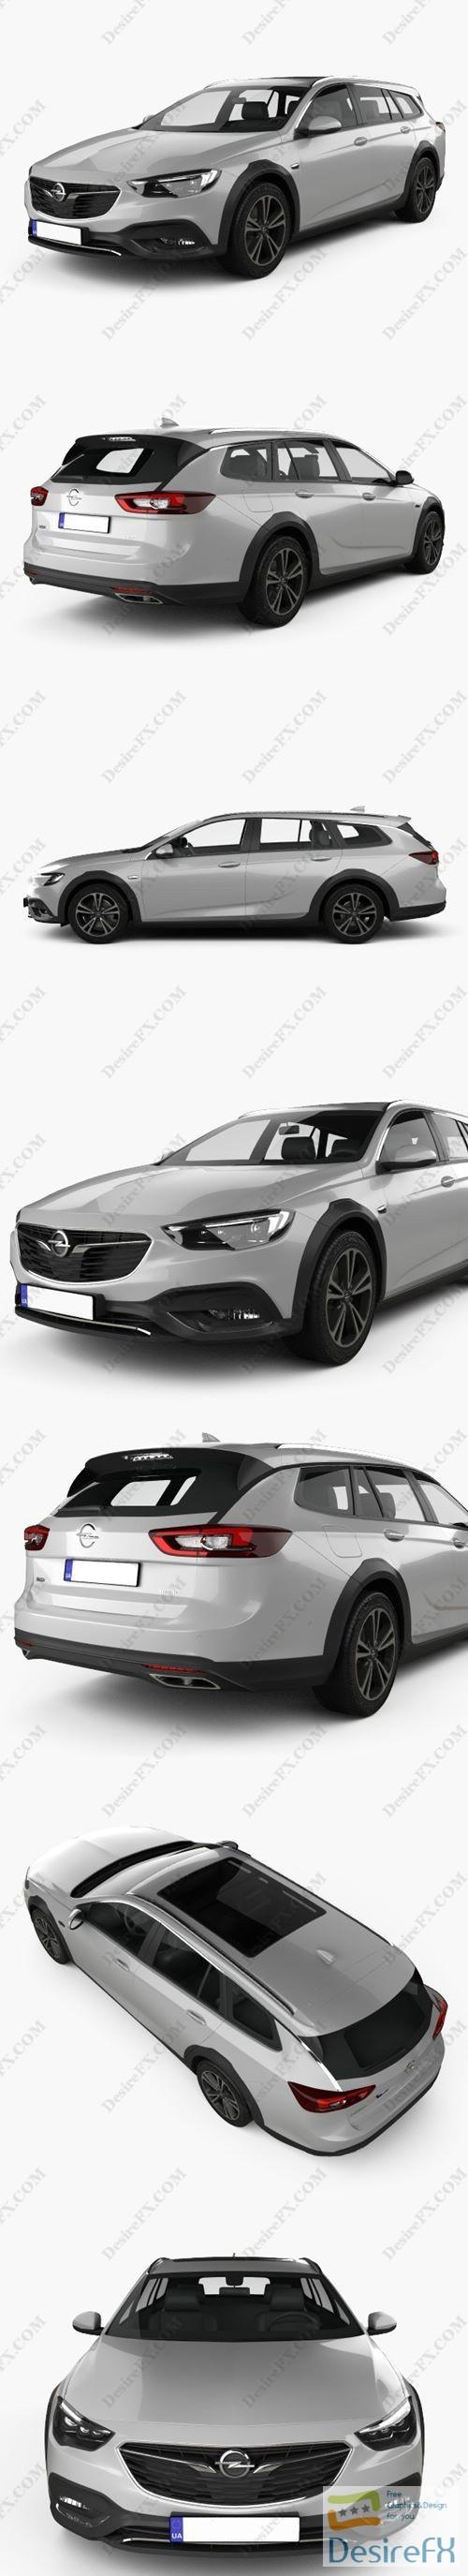 Opel Insignia Country Tourer 2017 3D Model